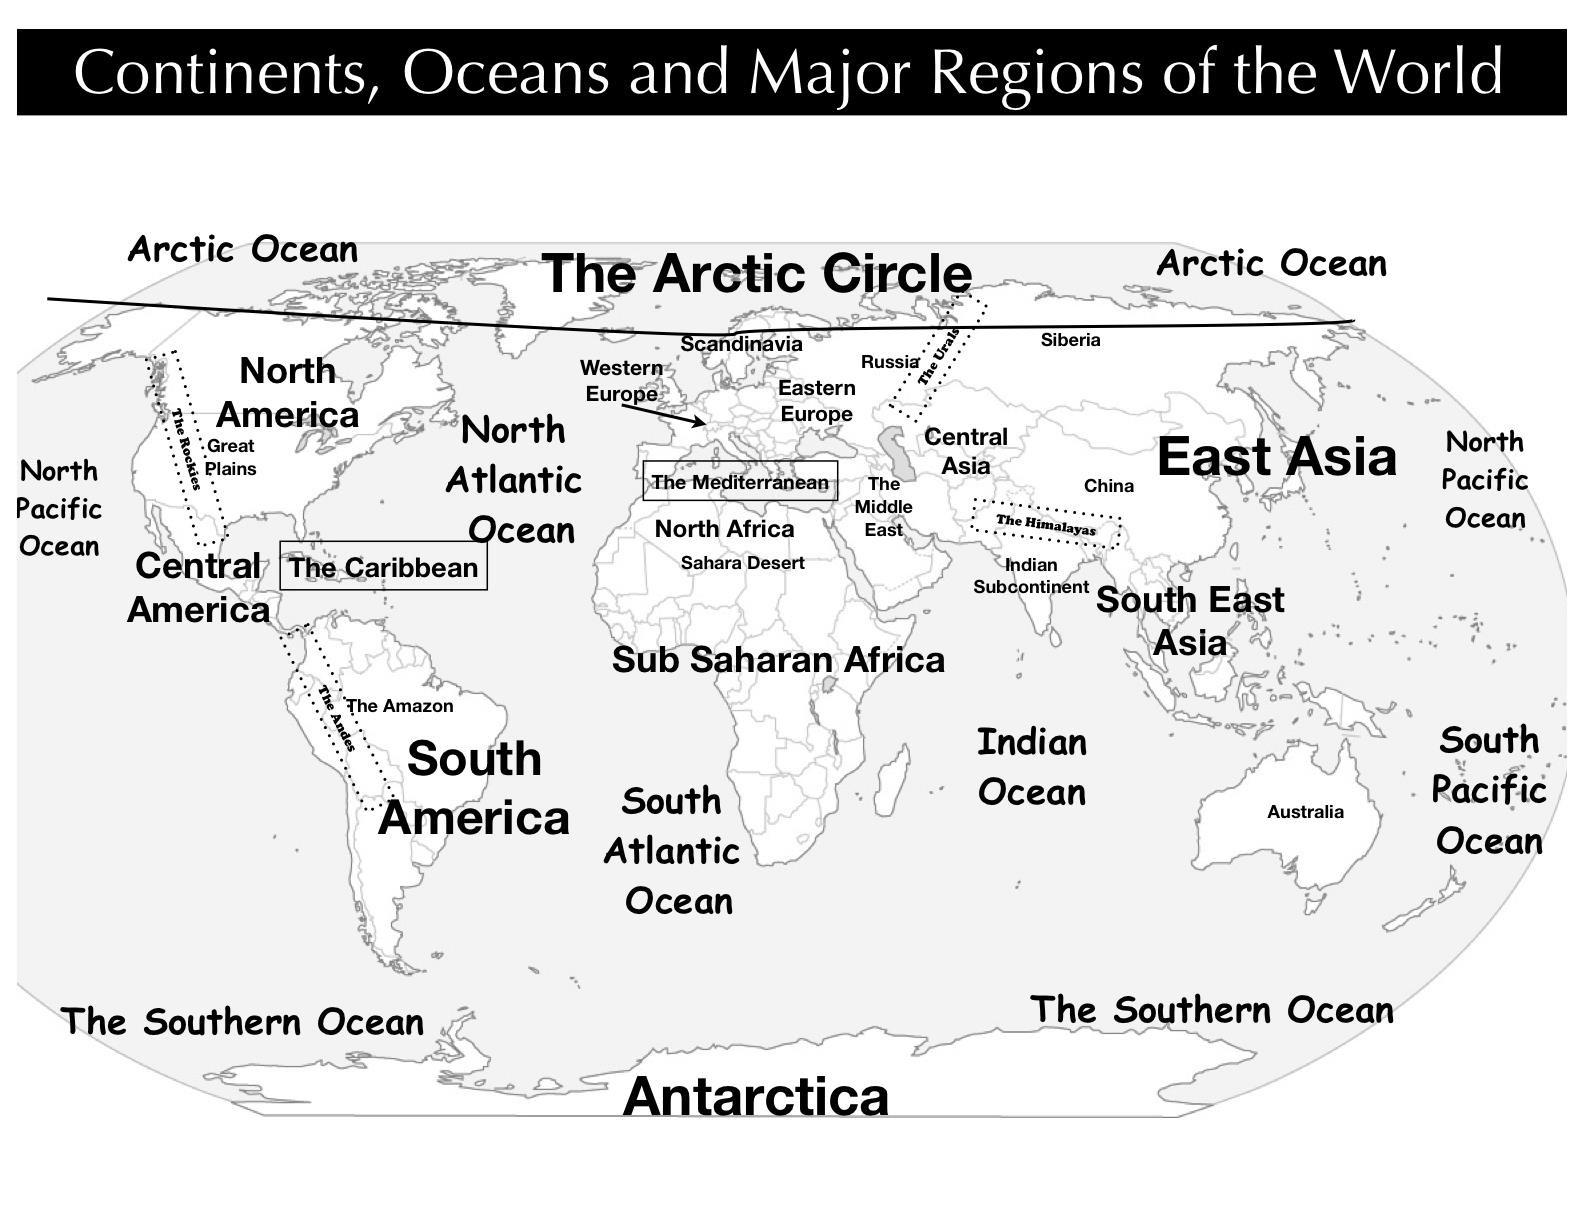 Continentsoceanregionsworldmapg map pictures continentsoceanregionsworldmapg gumiabroncs Image collections